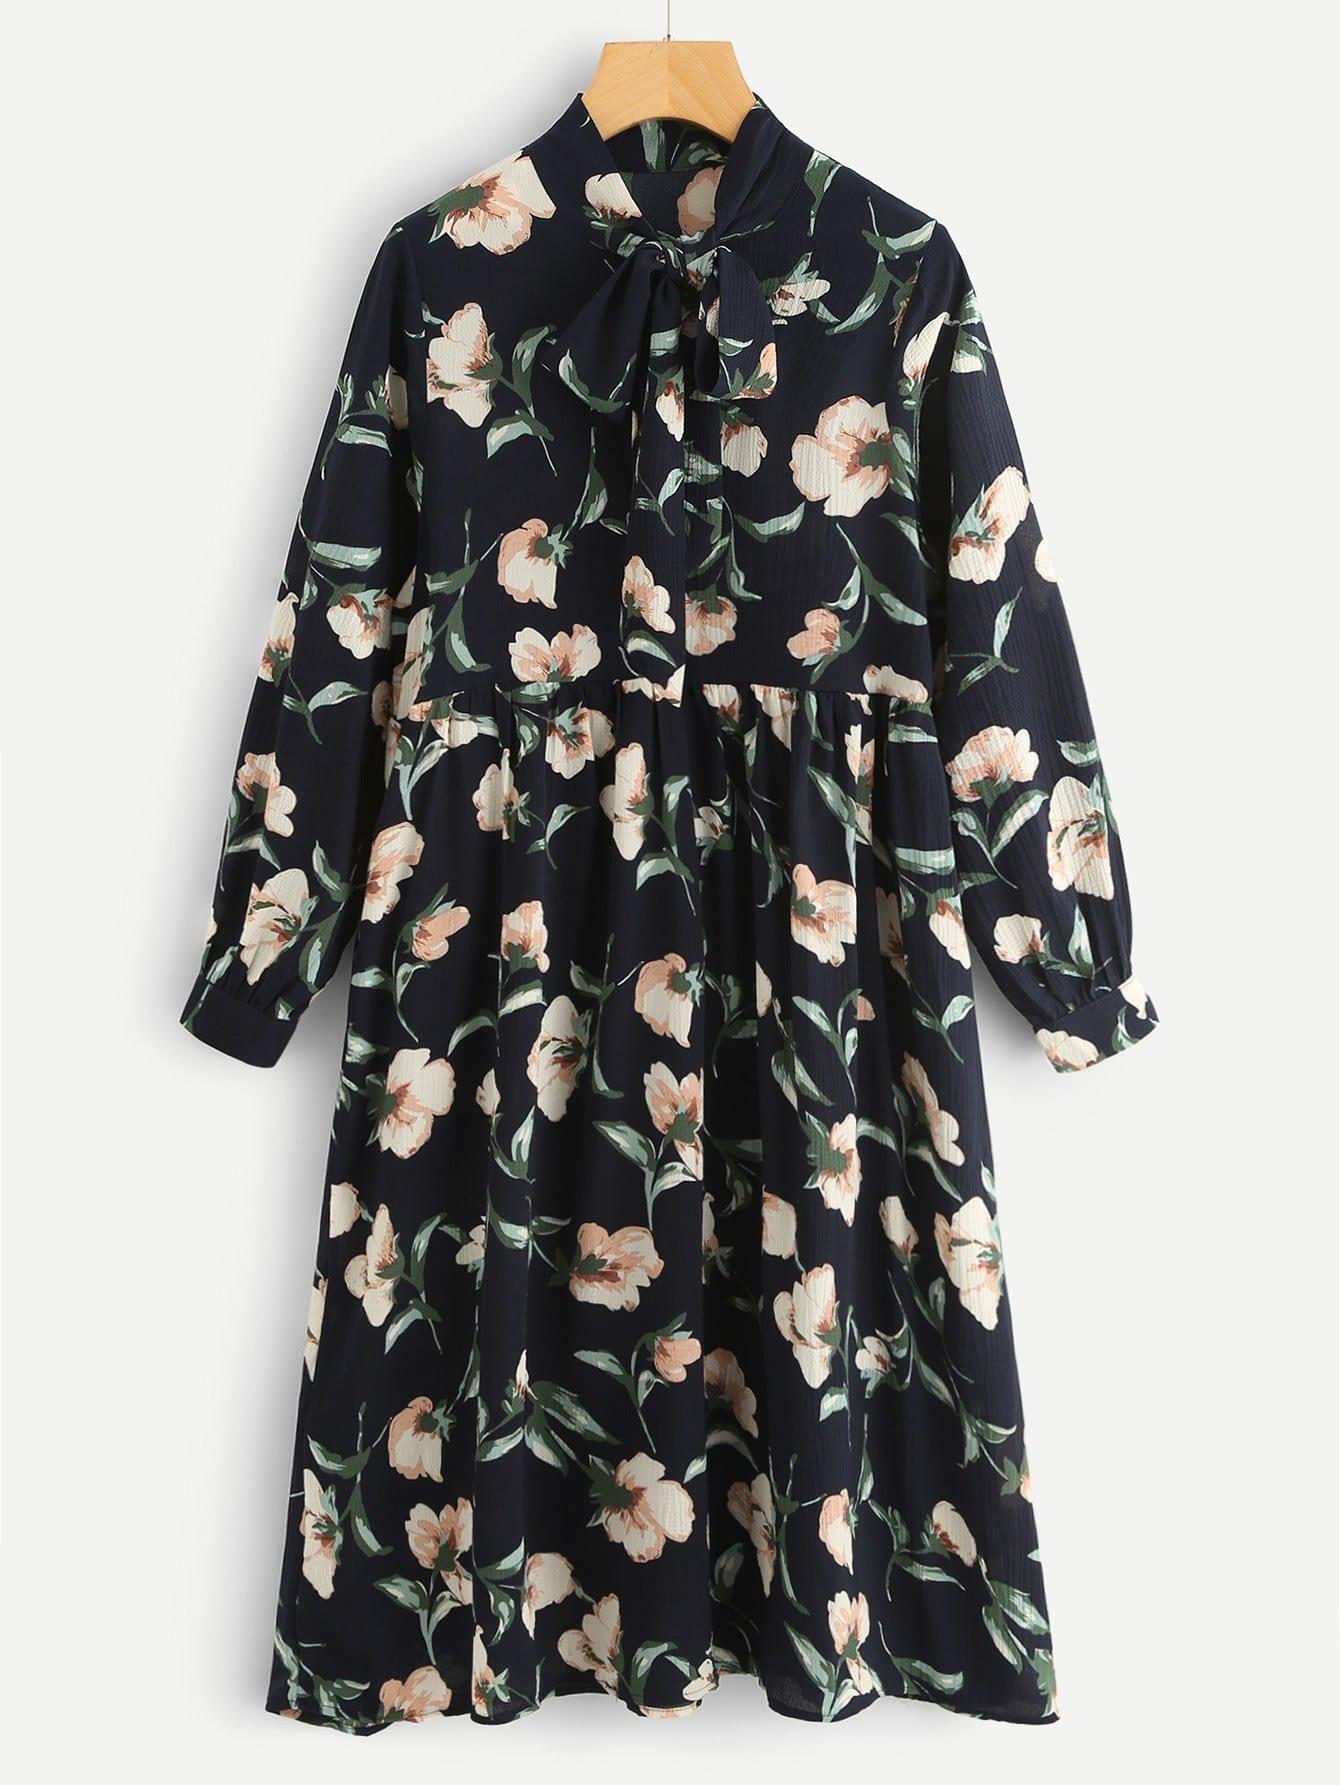 цена на All Over Botanical Print Bow Tie Neck Dress